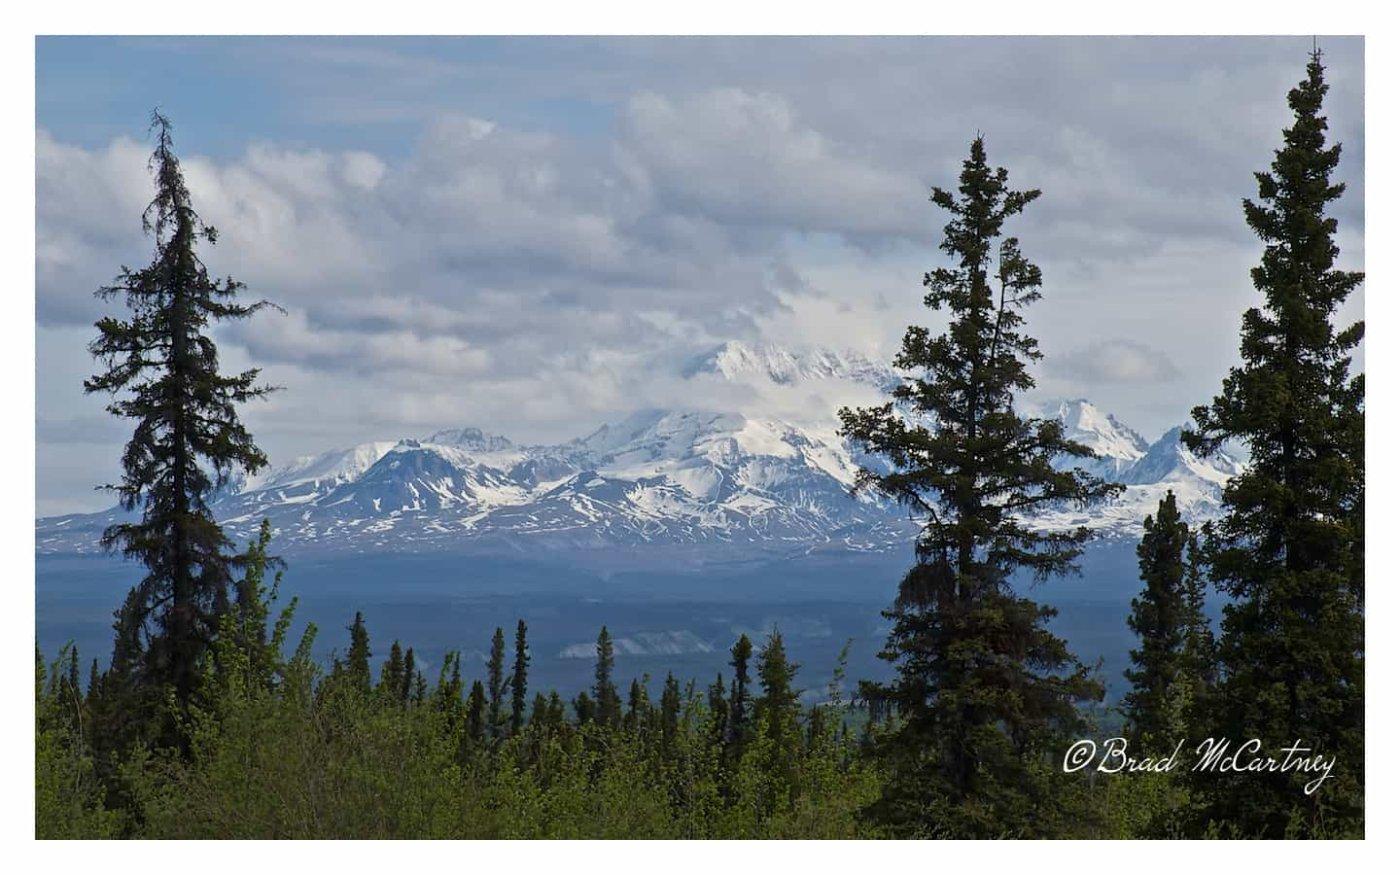 Wrangle St Elias National Park has some exceptional mountains